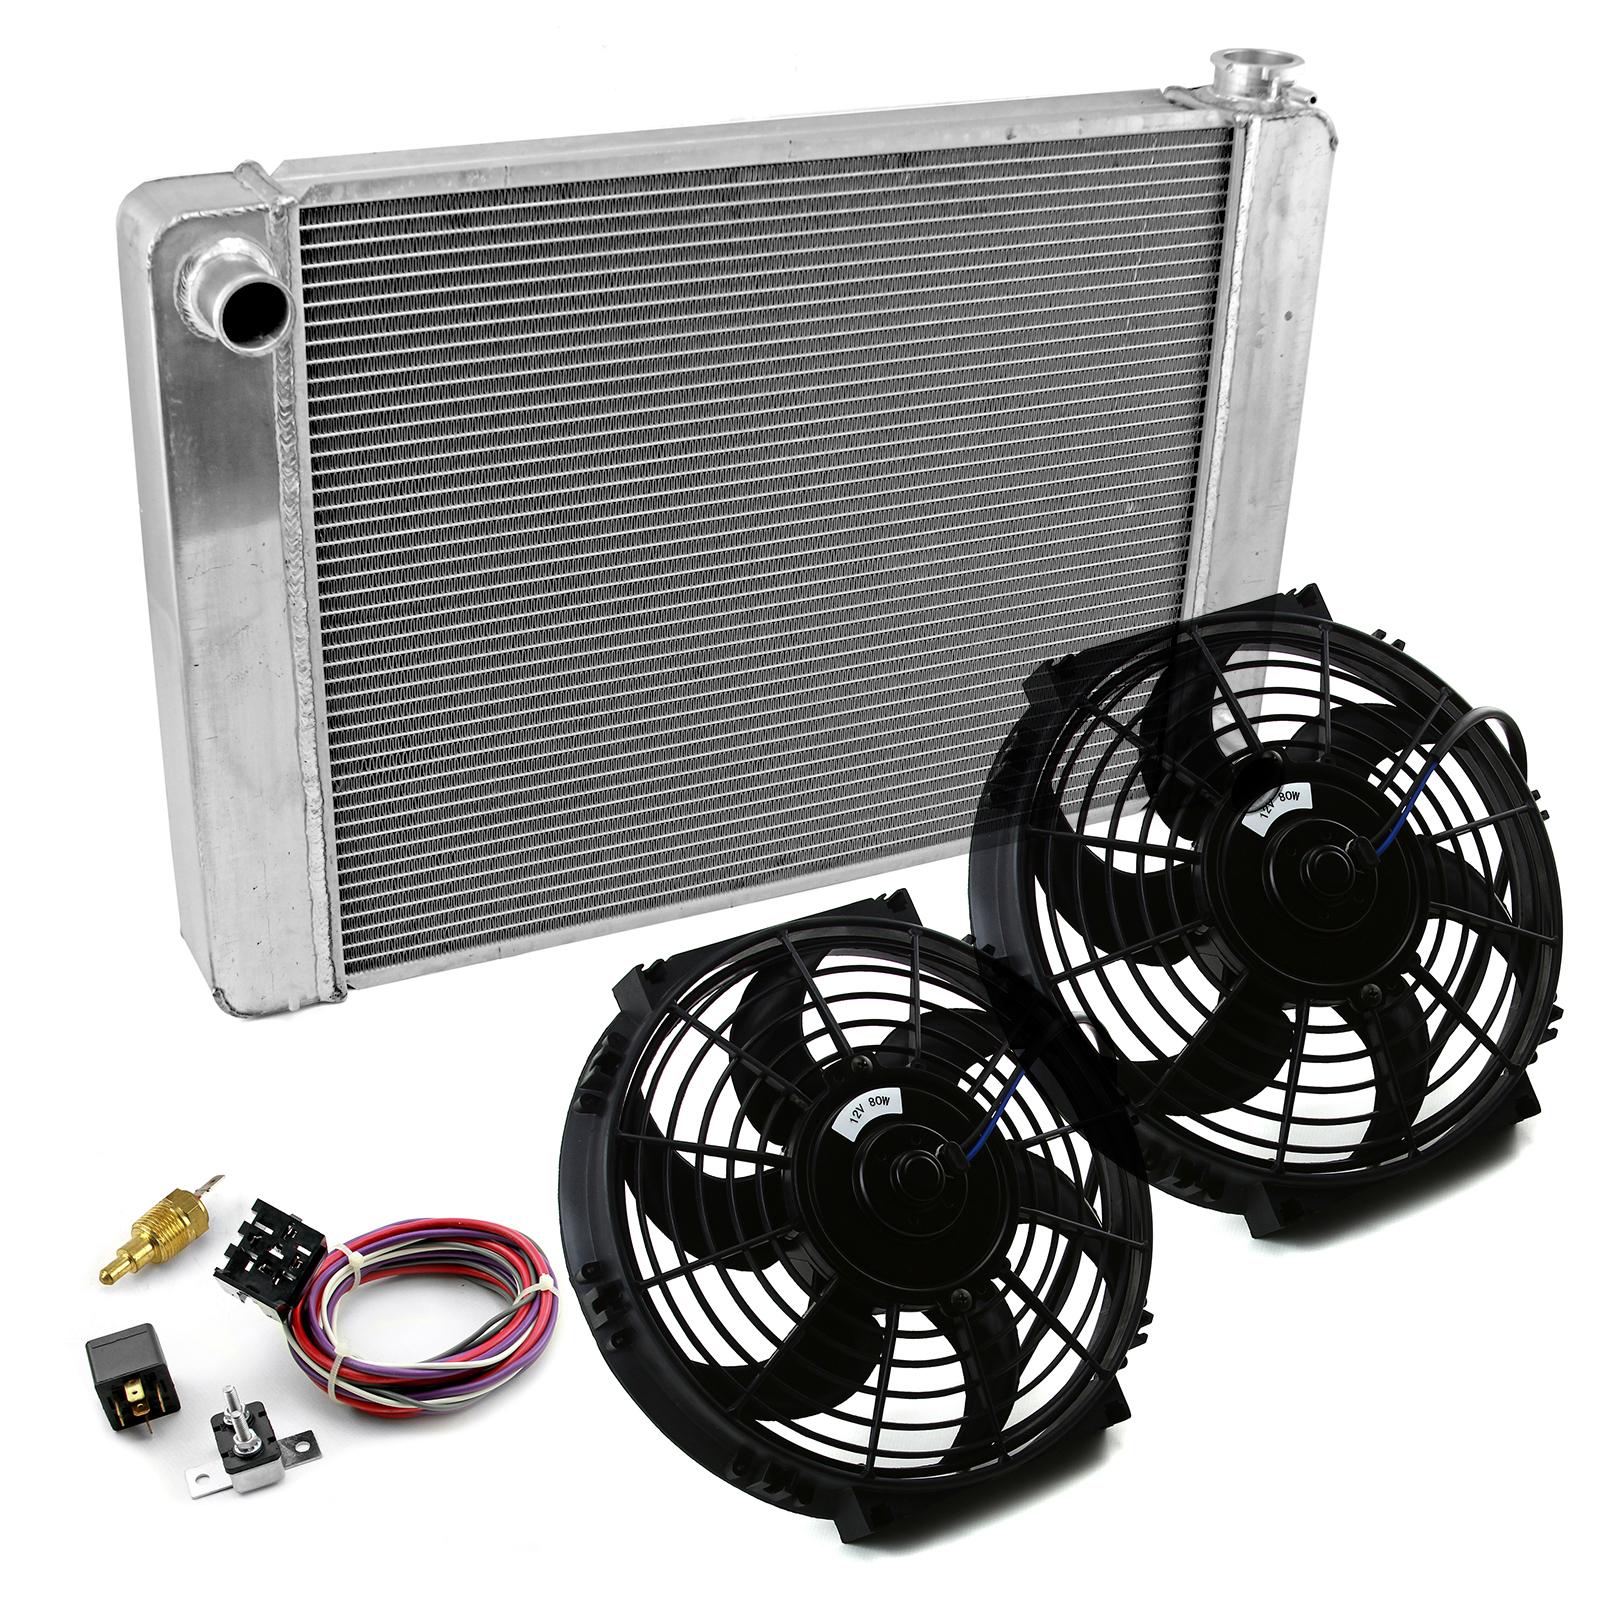 17 X 28 Core Crossflow Radiator Aluminum Radiators And